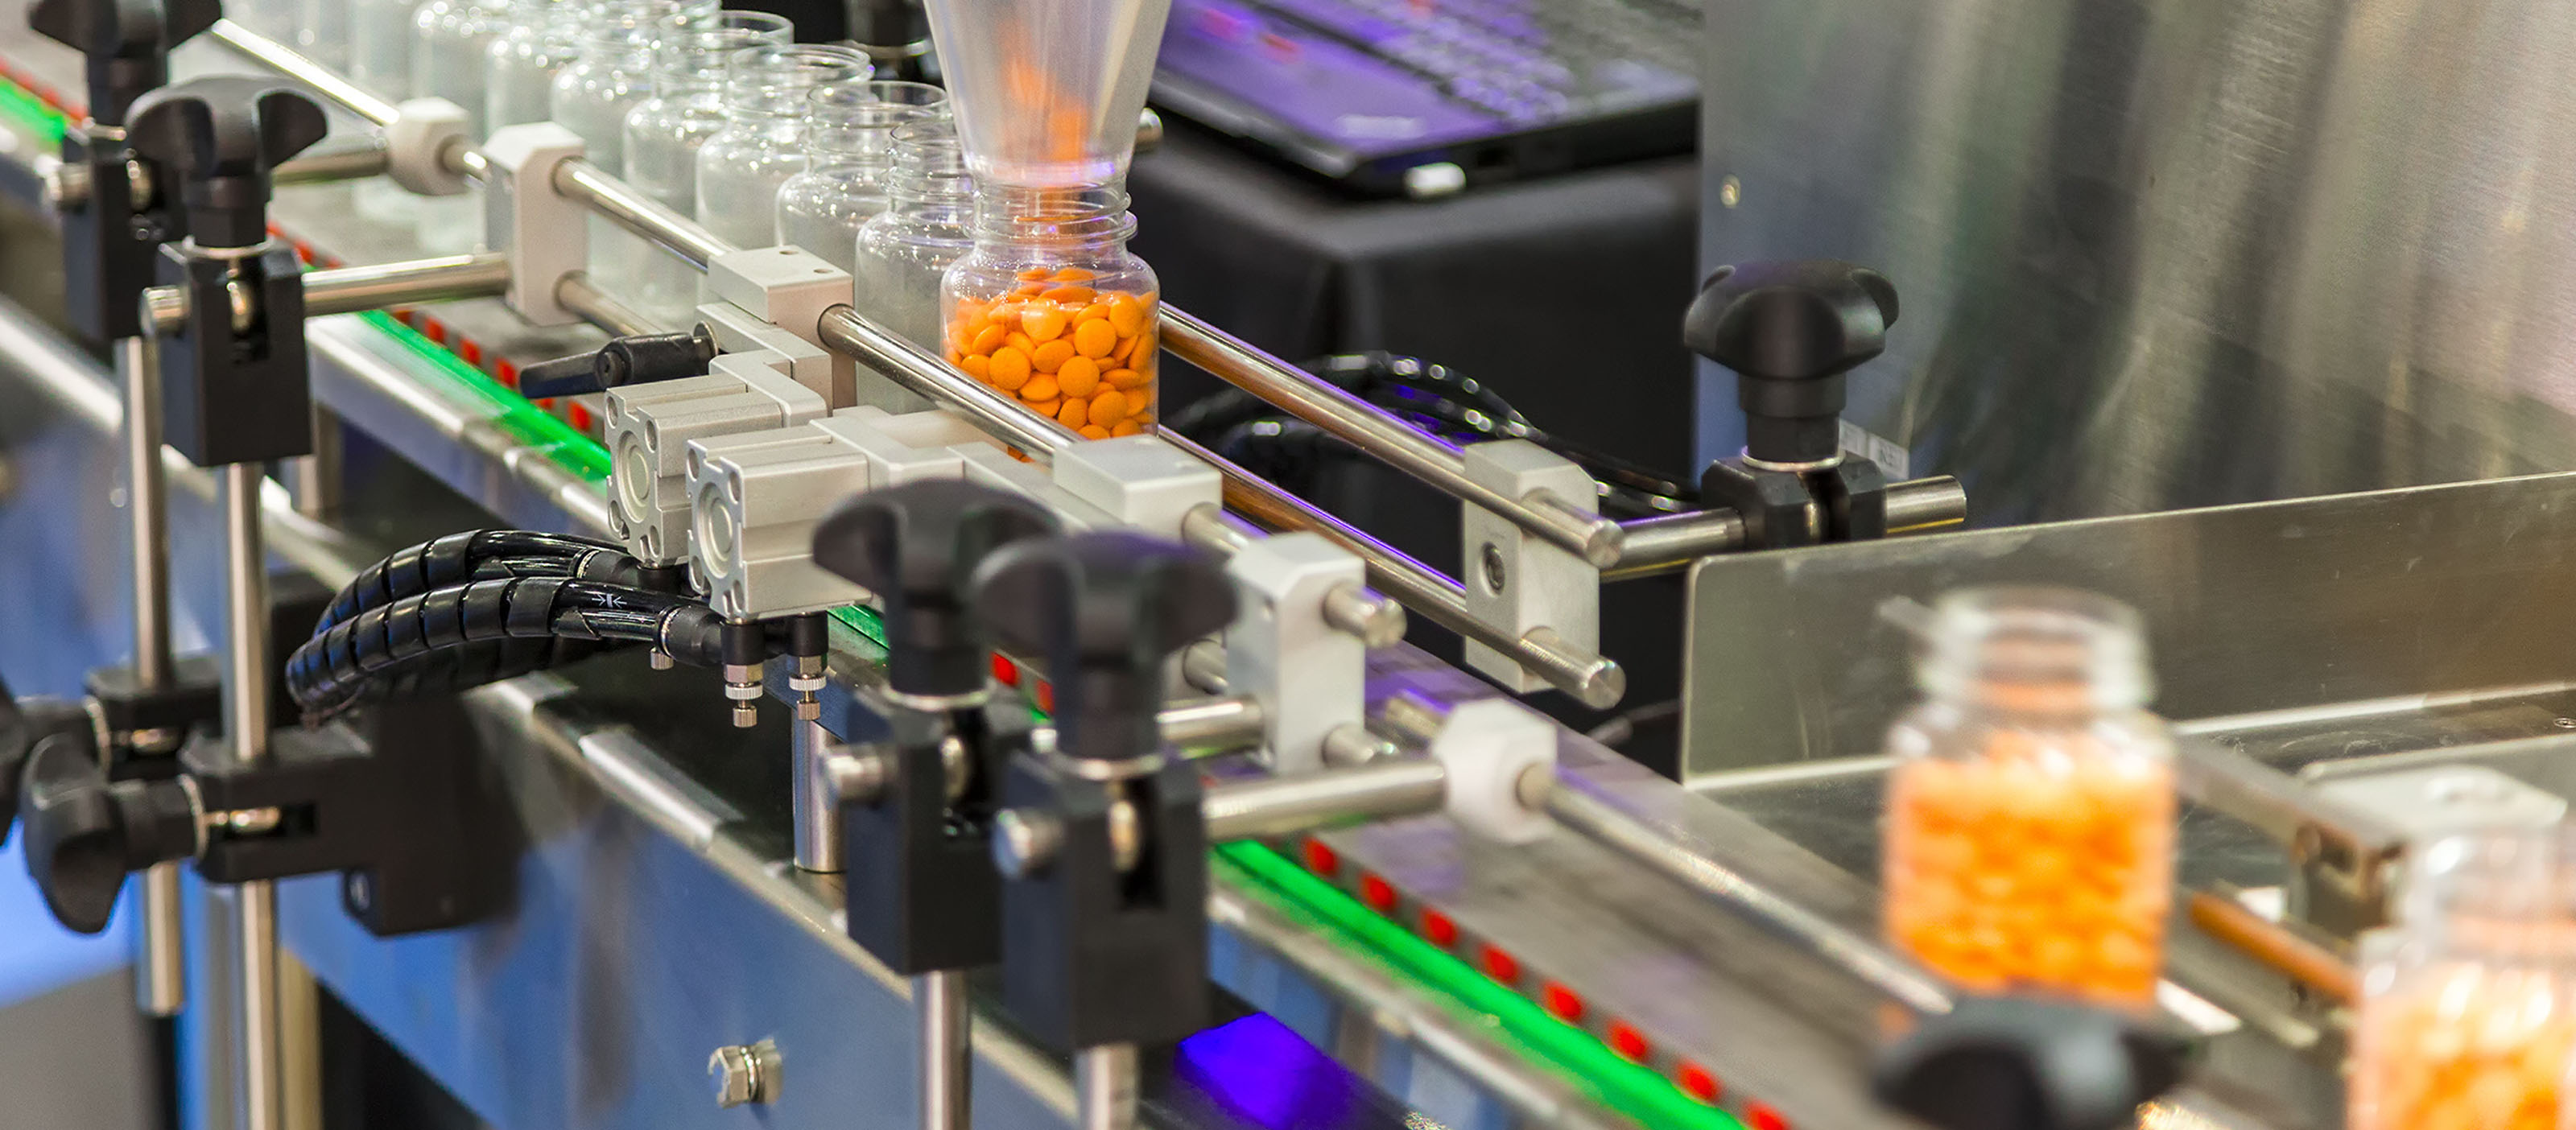 Reckitt Benckiser tablets manufacturing